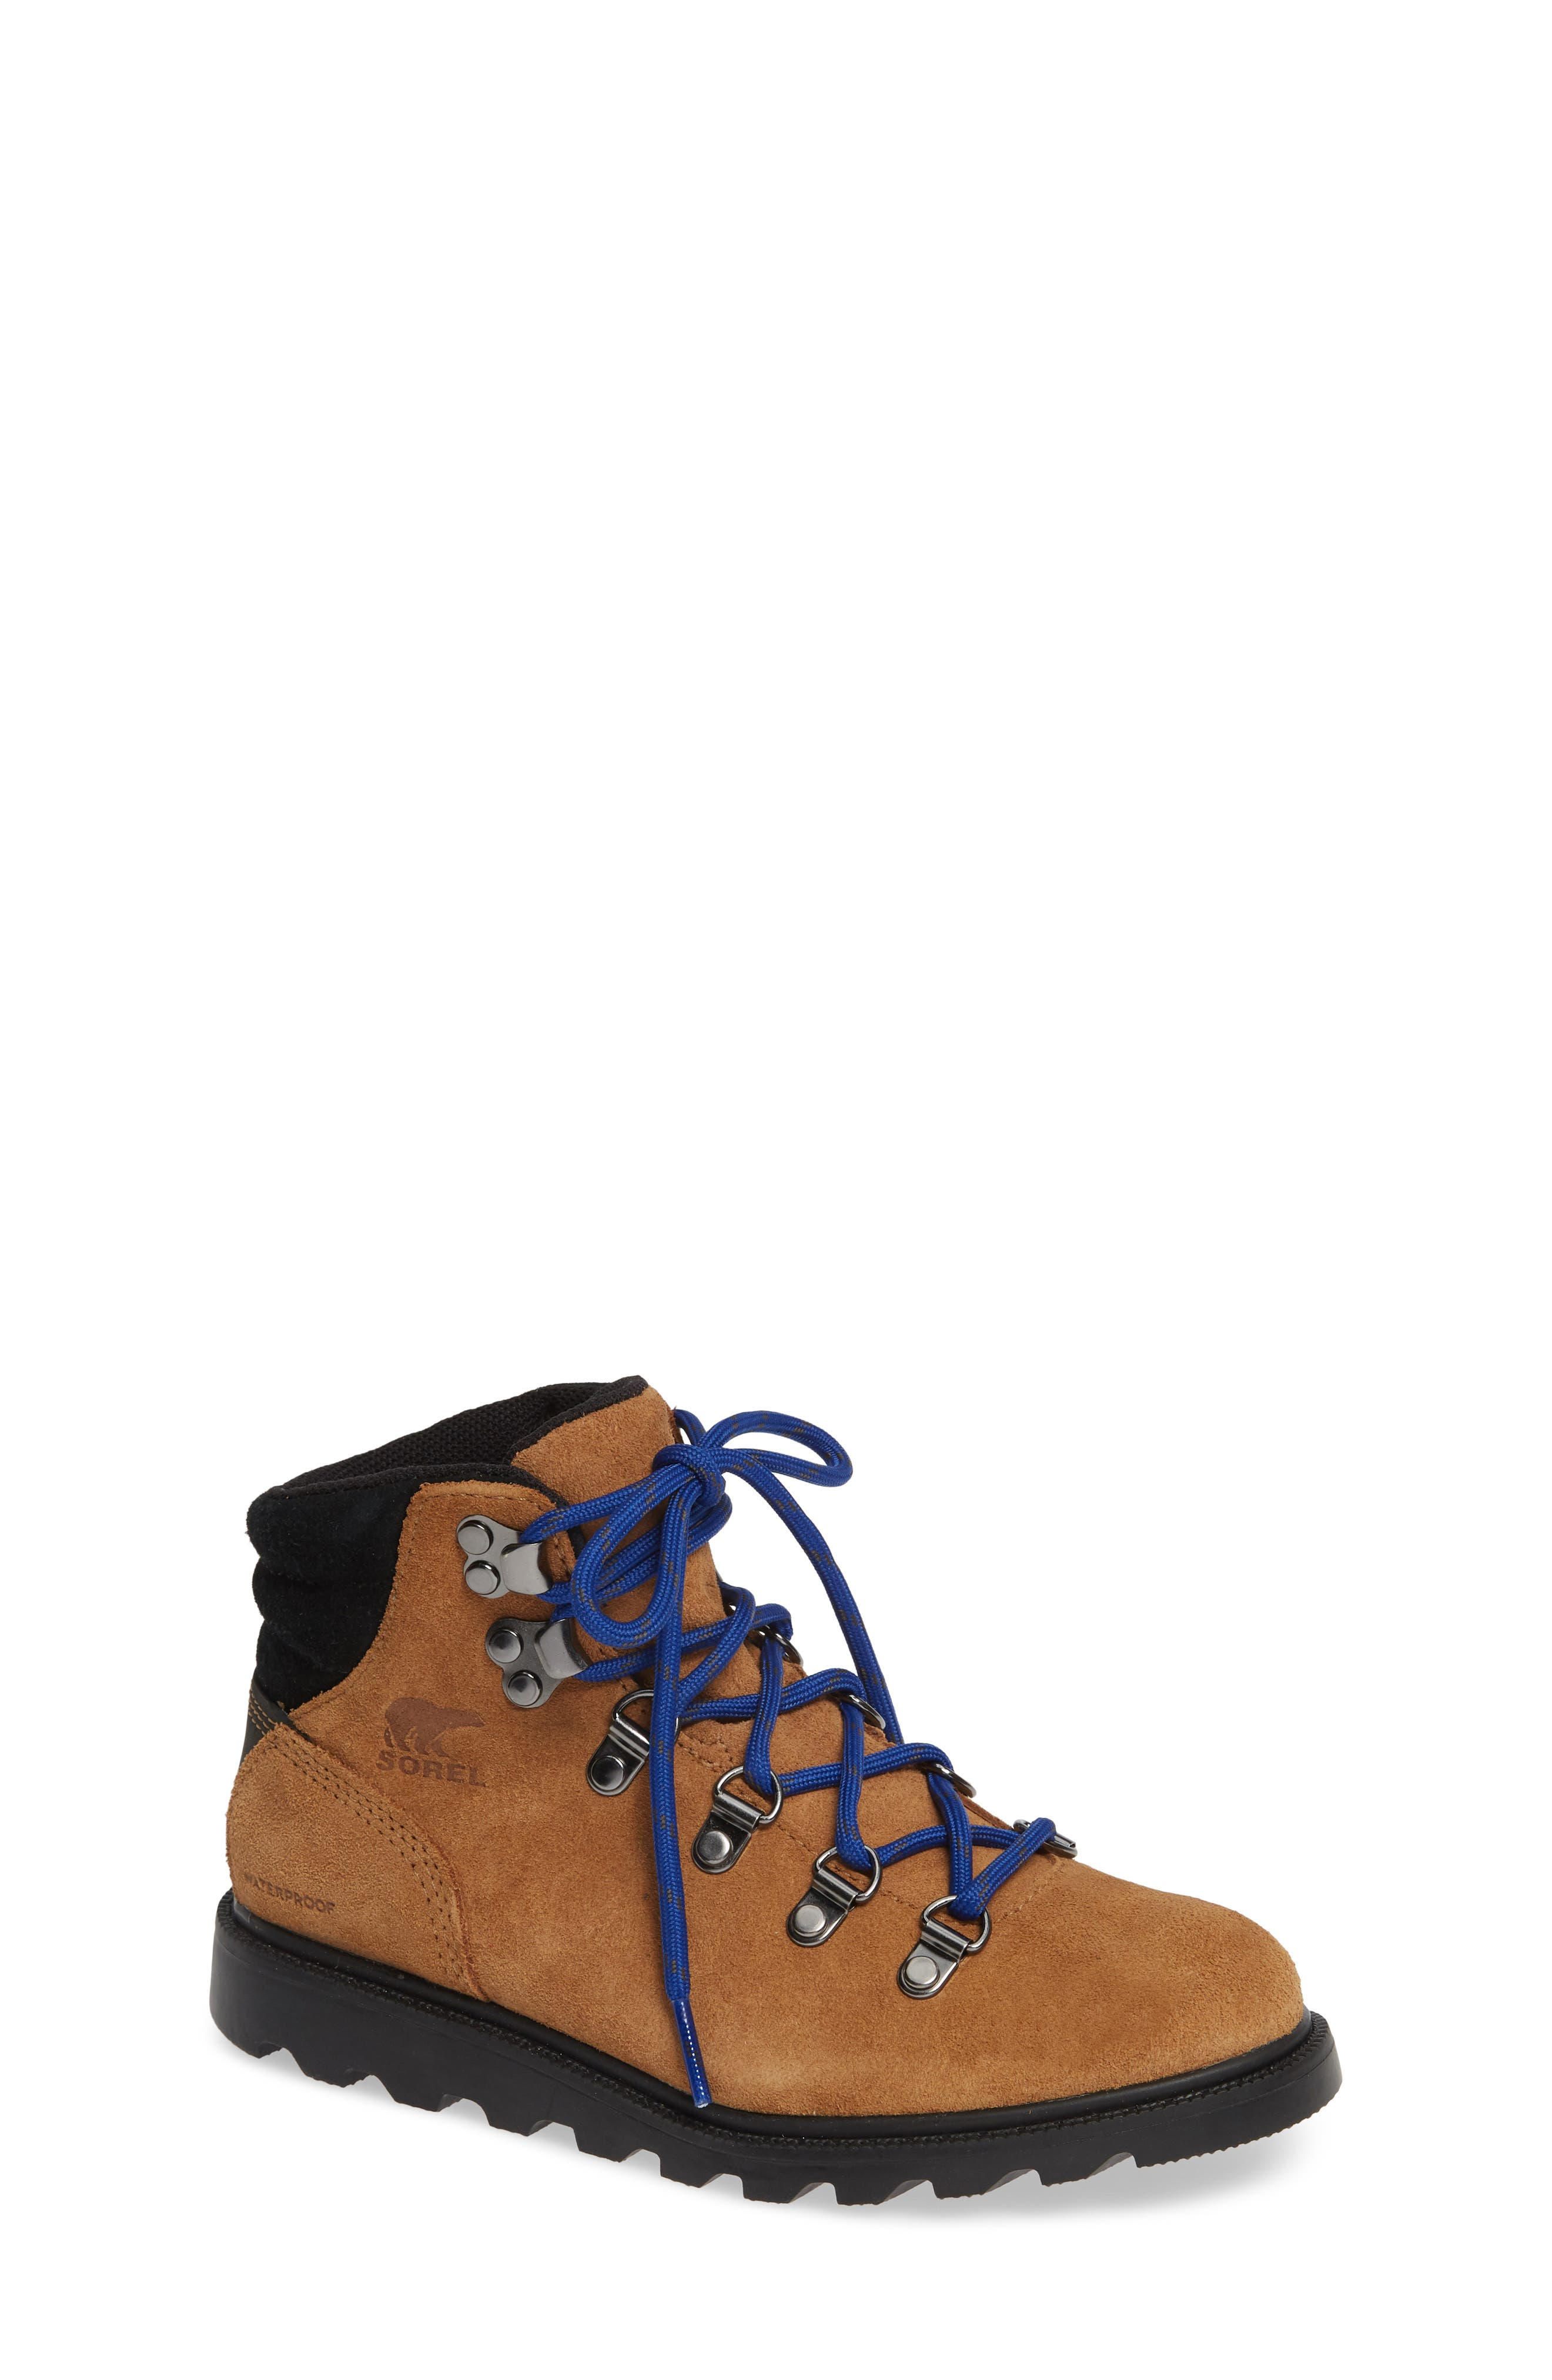 Madison Waterproof Hiker Boot,                             Main thumbnail 1, color,                             CAMEL BROWN/ BLACK